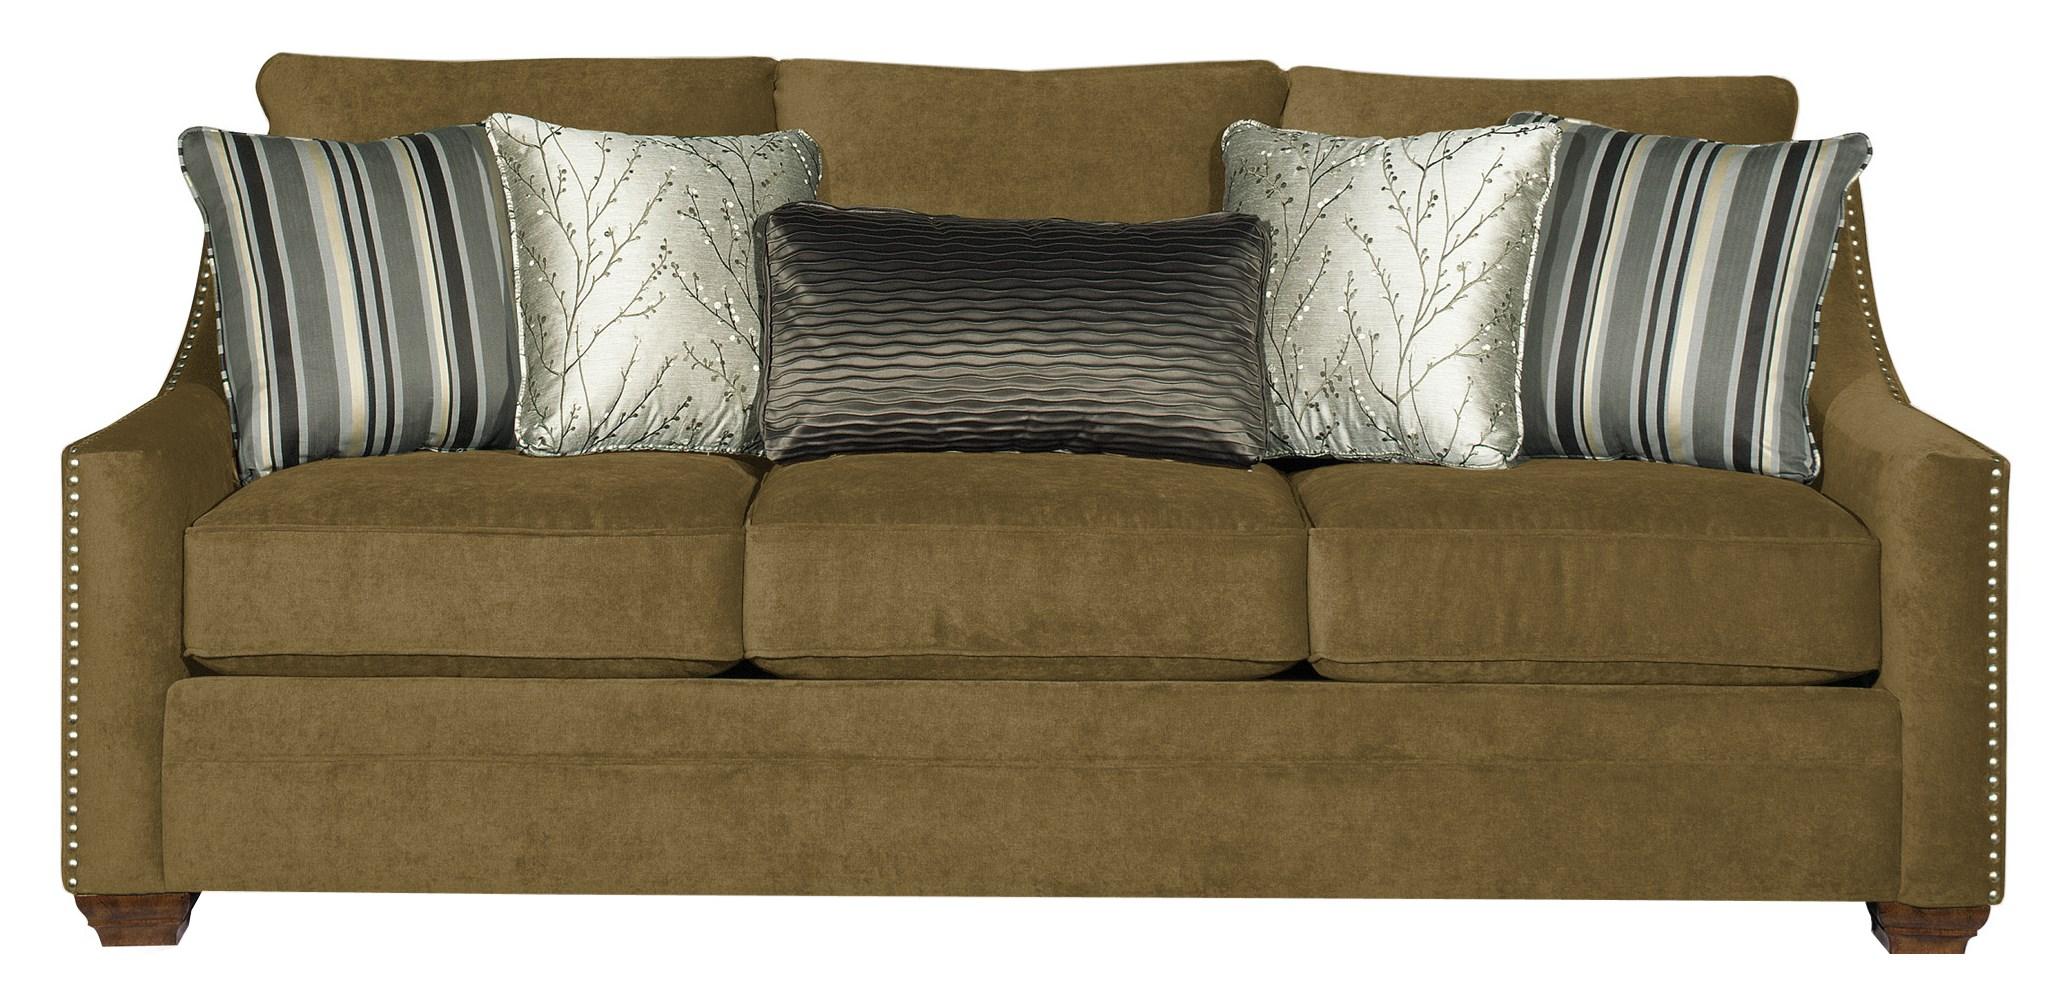 Craftmaster 7335 Sofa - Item Number: 733550-MONET-09